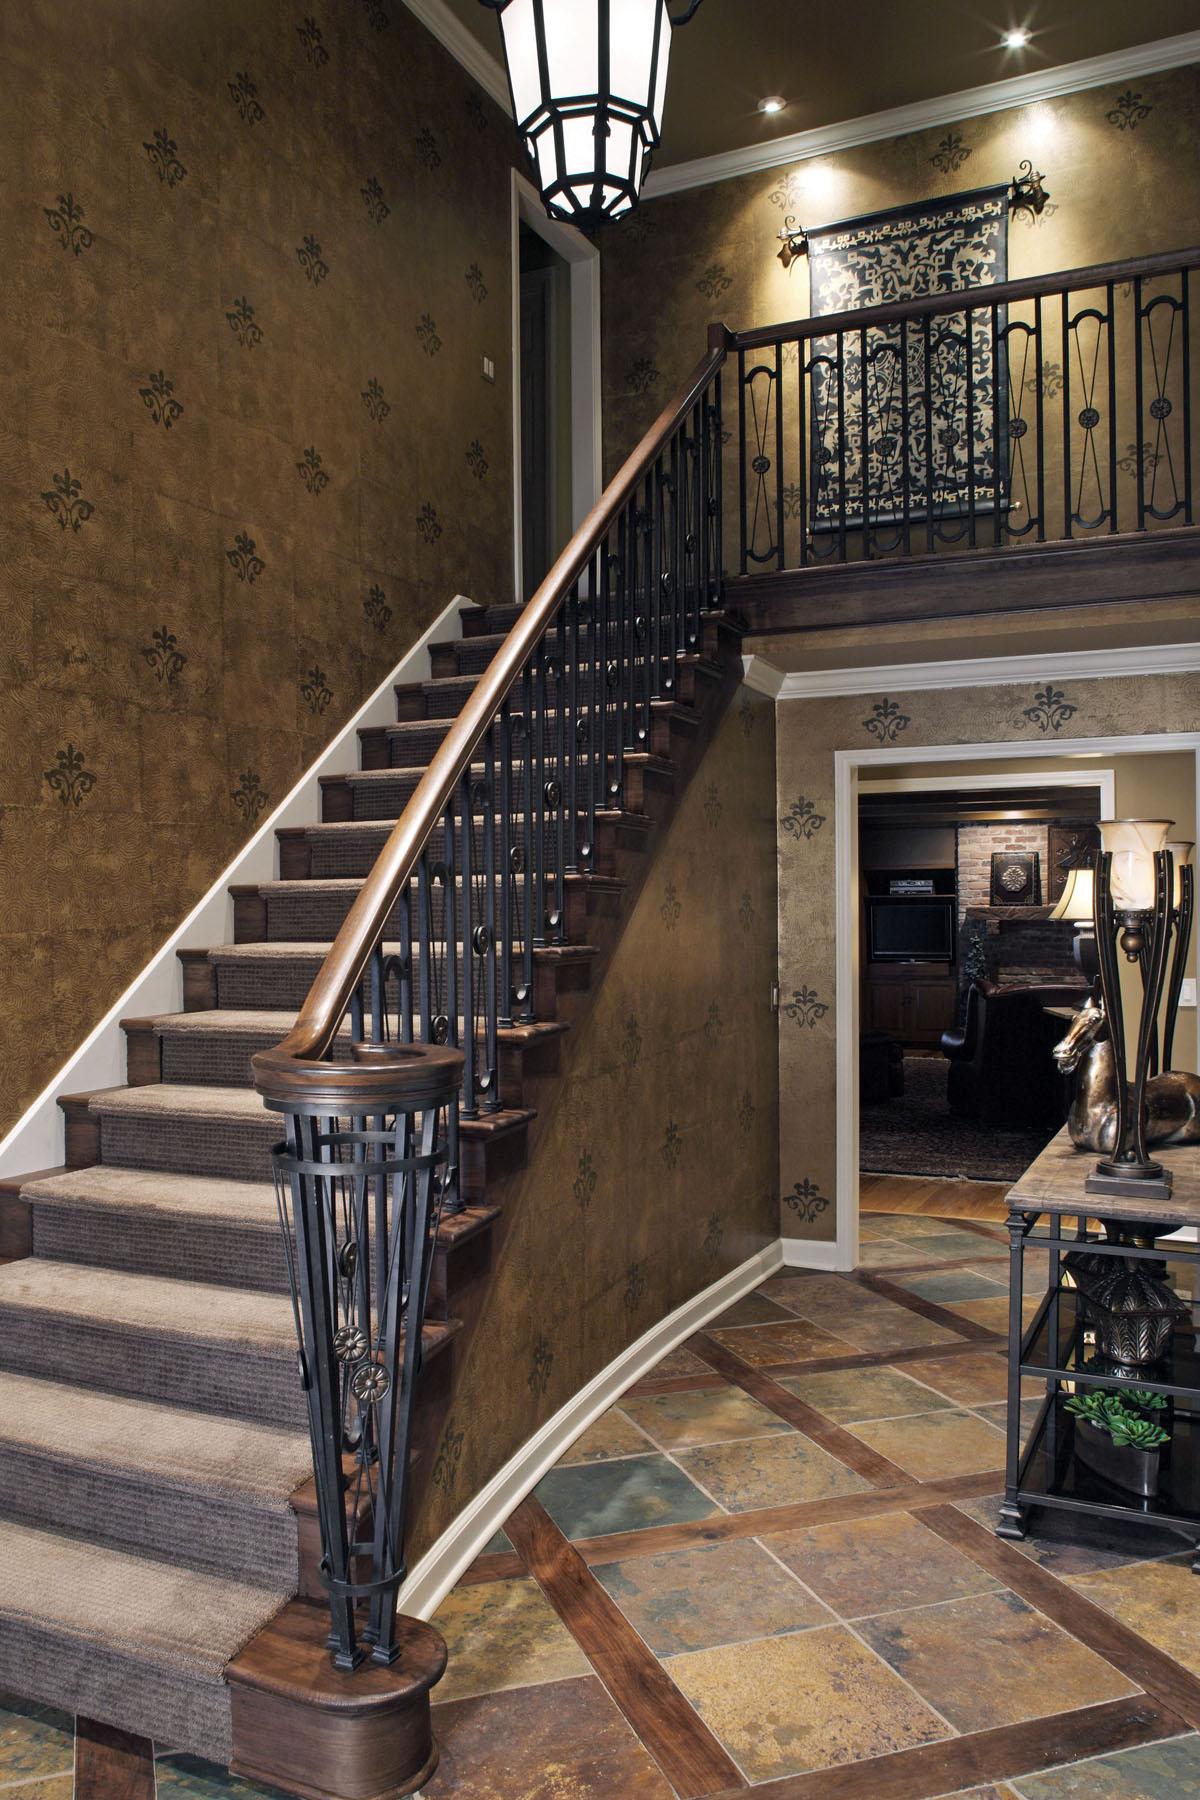 Transitional-Entry-Stairway.jpg